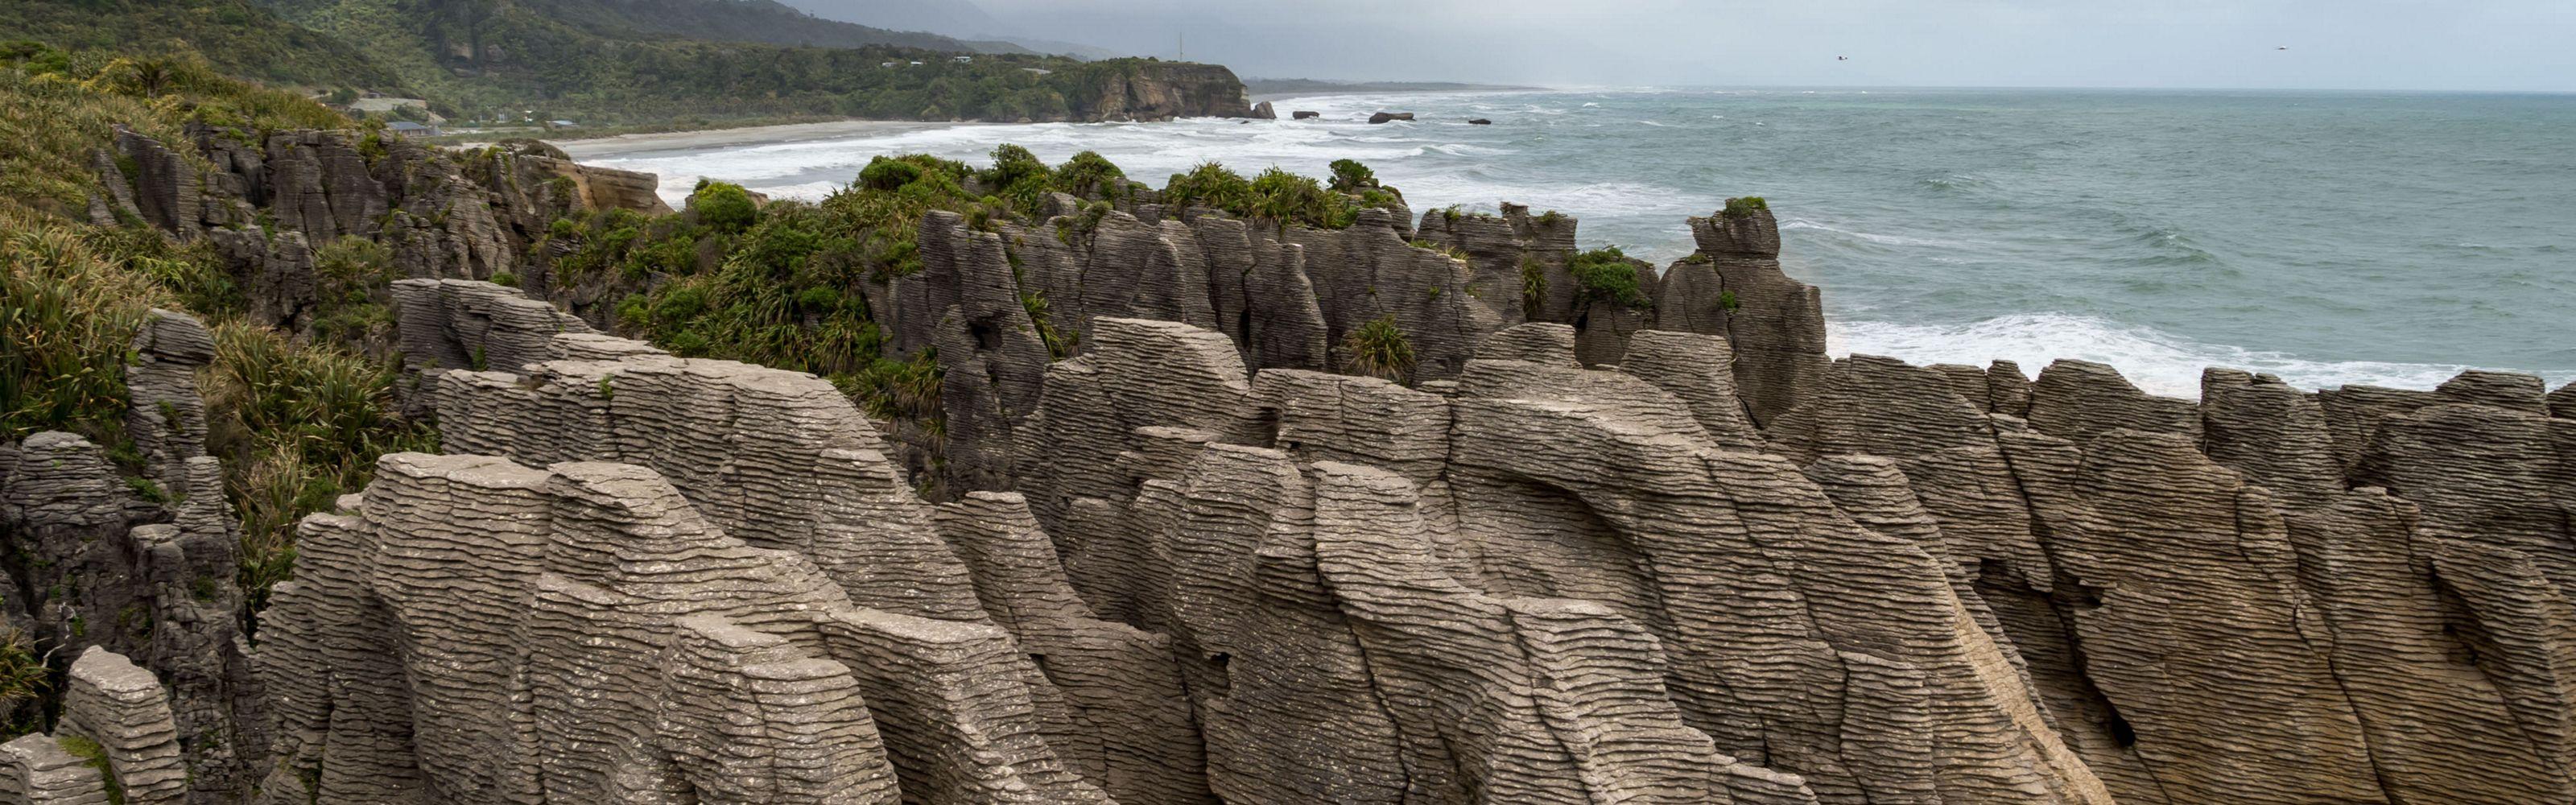 on the west coast of New Zealand.